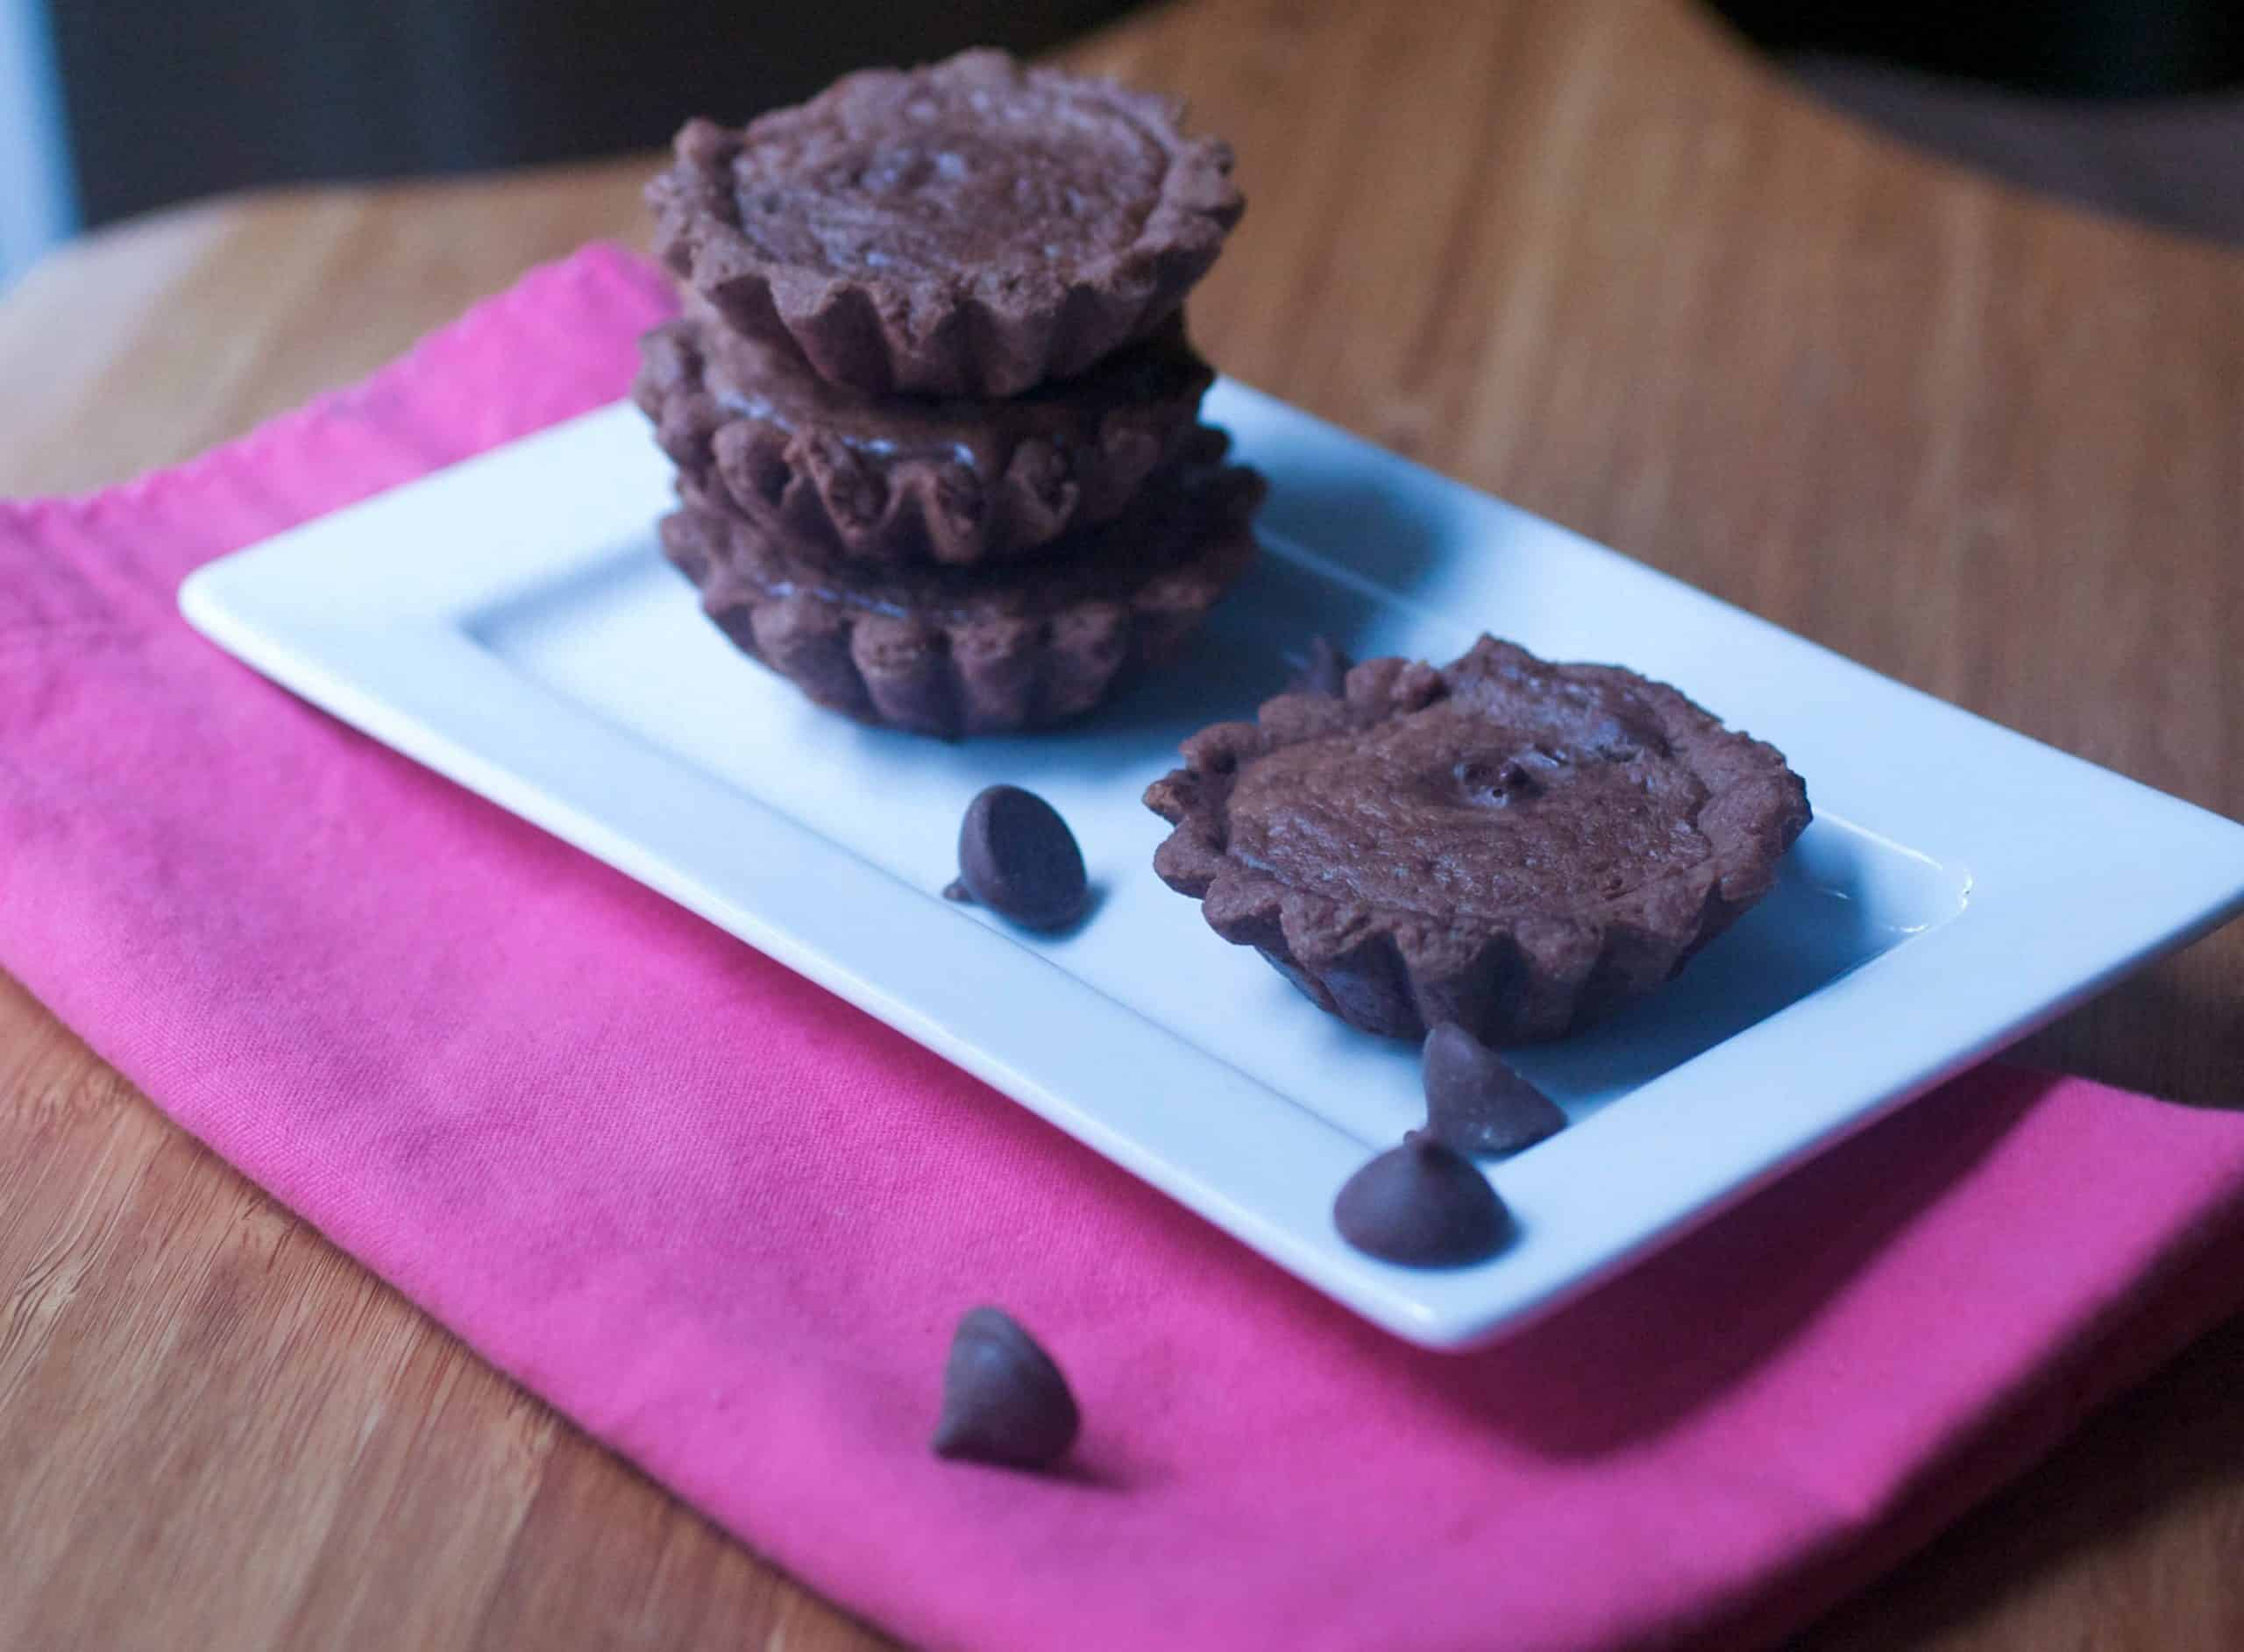 Tuesdays With Dorie: Chocolate Truffle Tarts